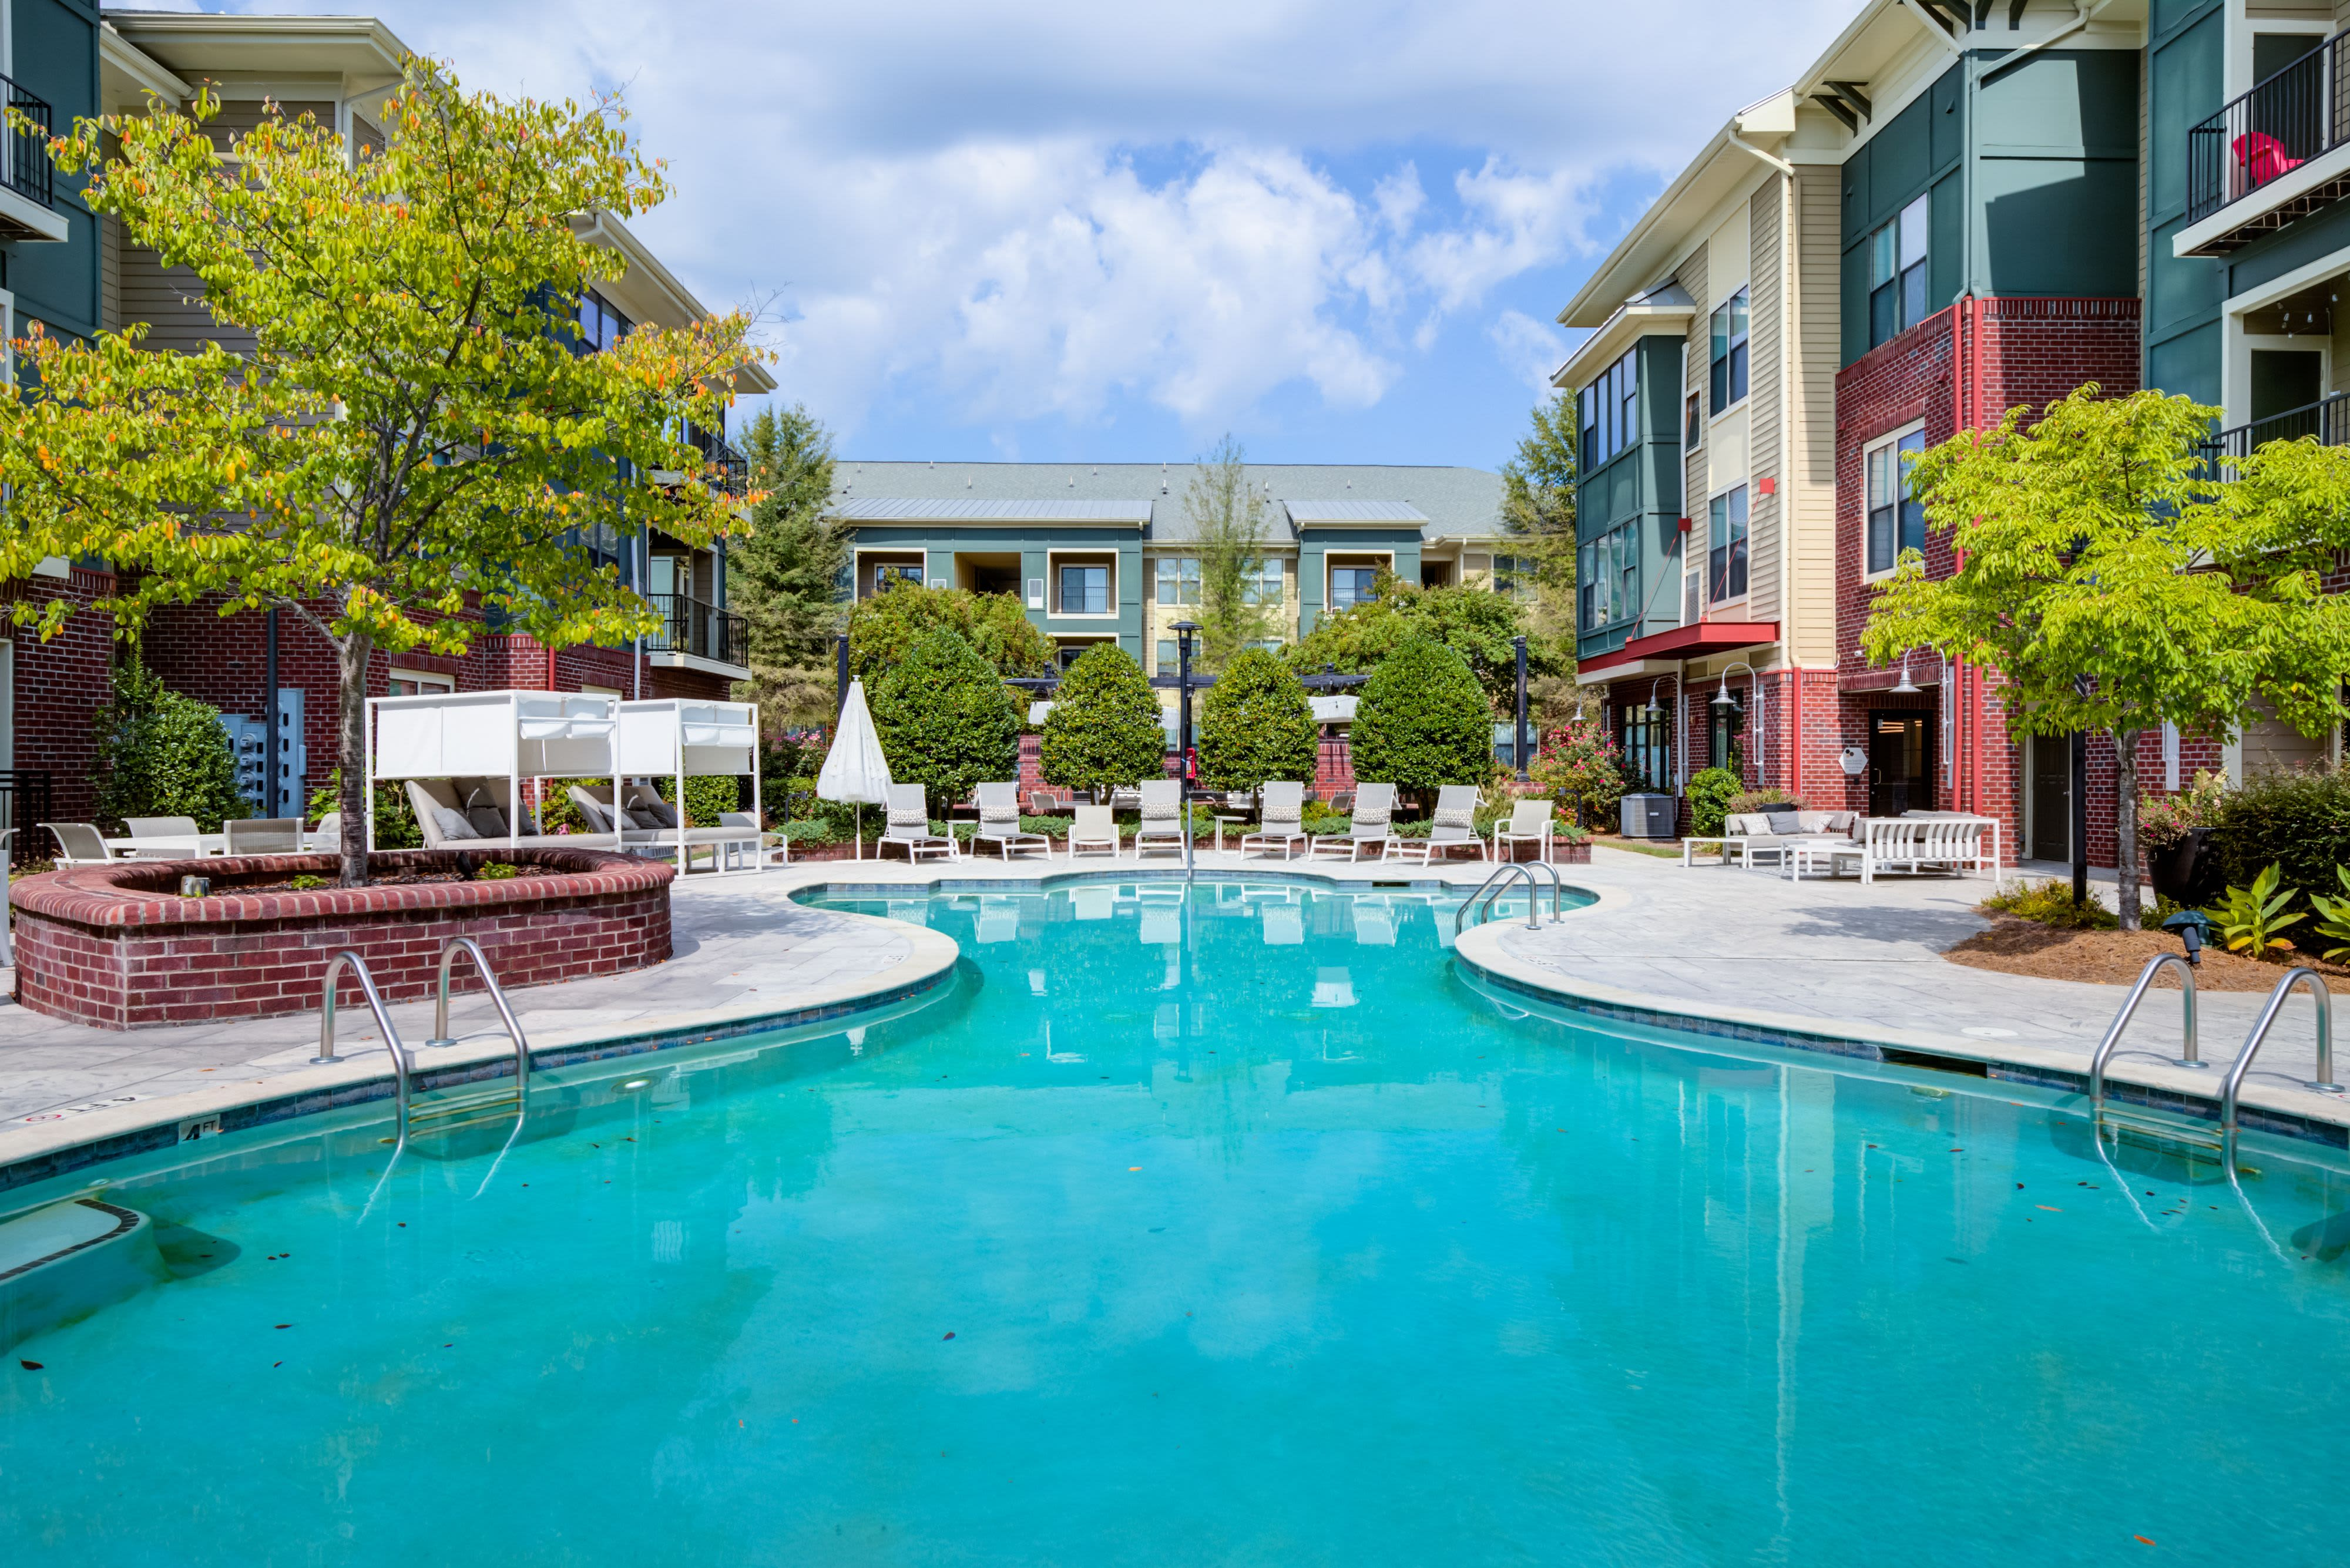 Swimming pool at Celsius Apartment Homes in Charlotte, North Carolina